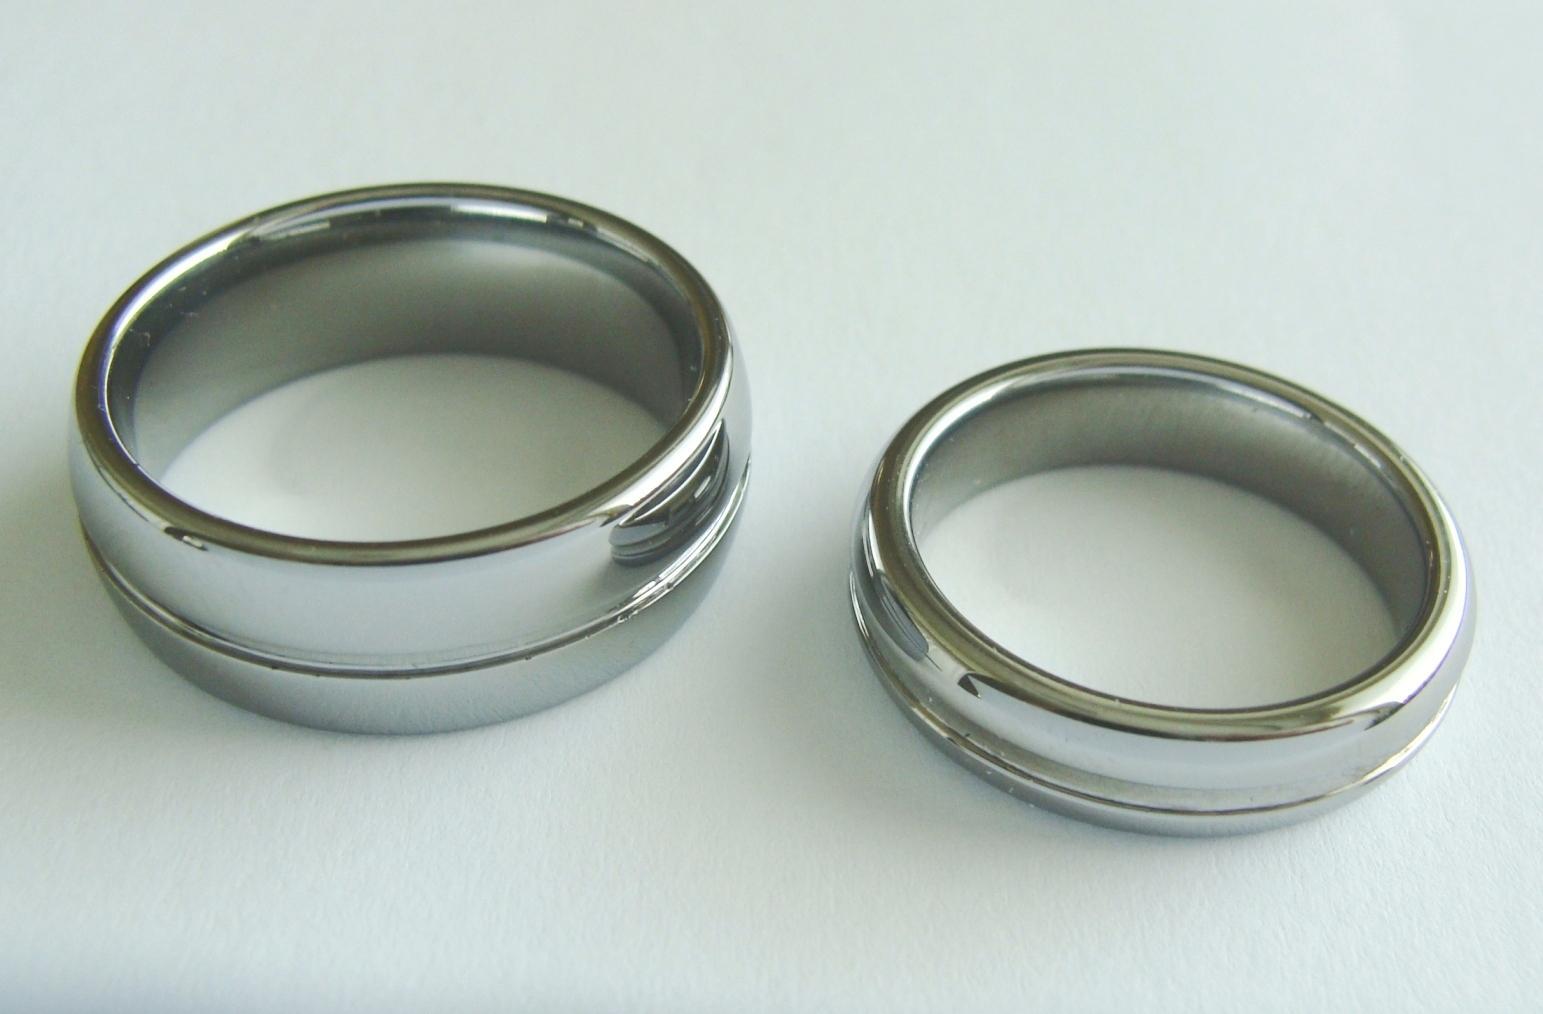 Snubni Prsteny Z Wolframu 800 Kc Svatebni Bazar Beremese Cz